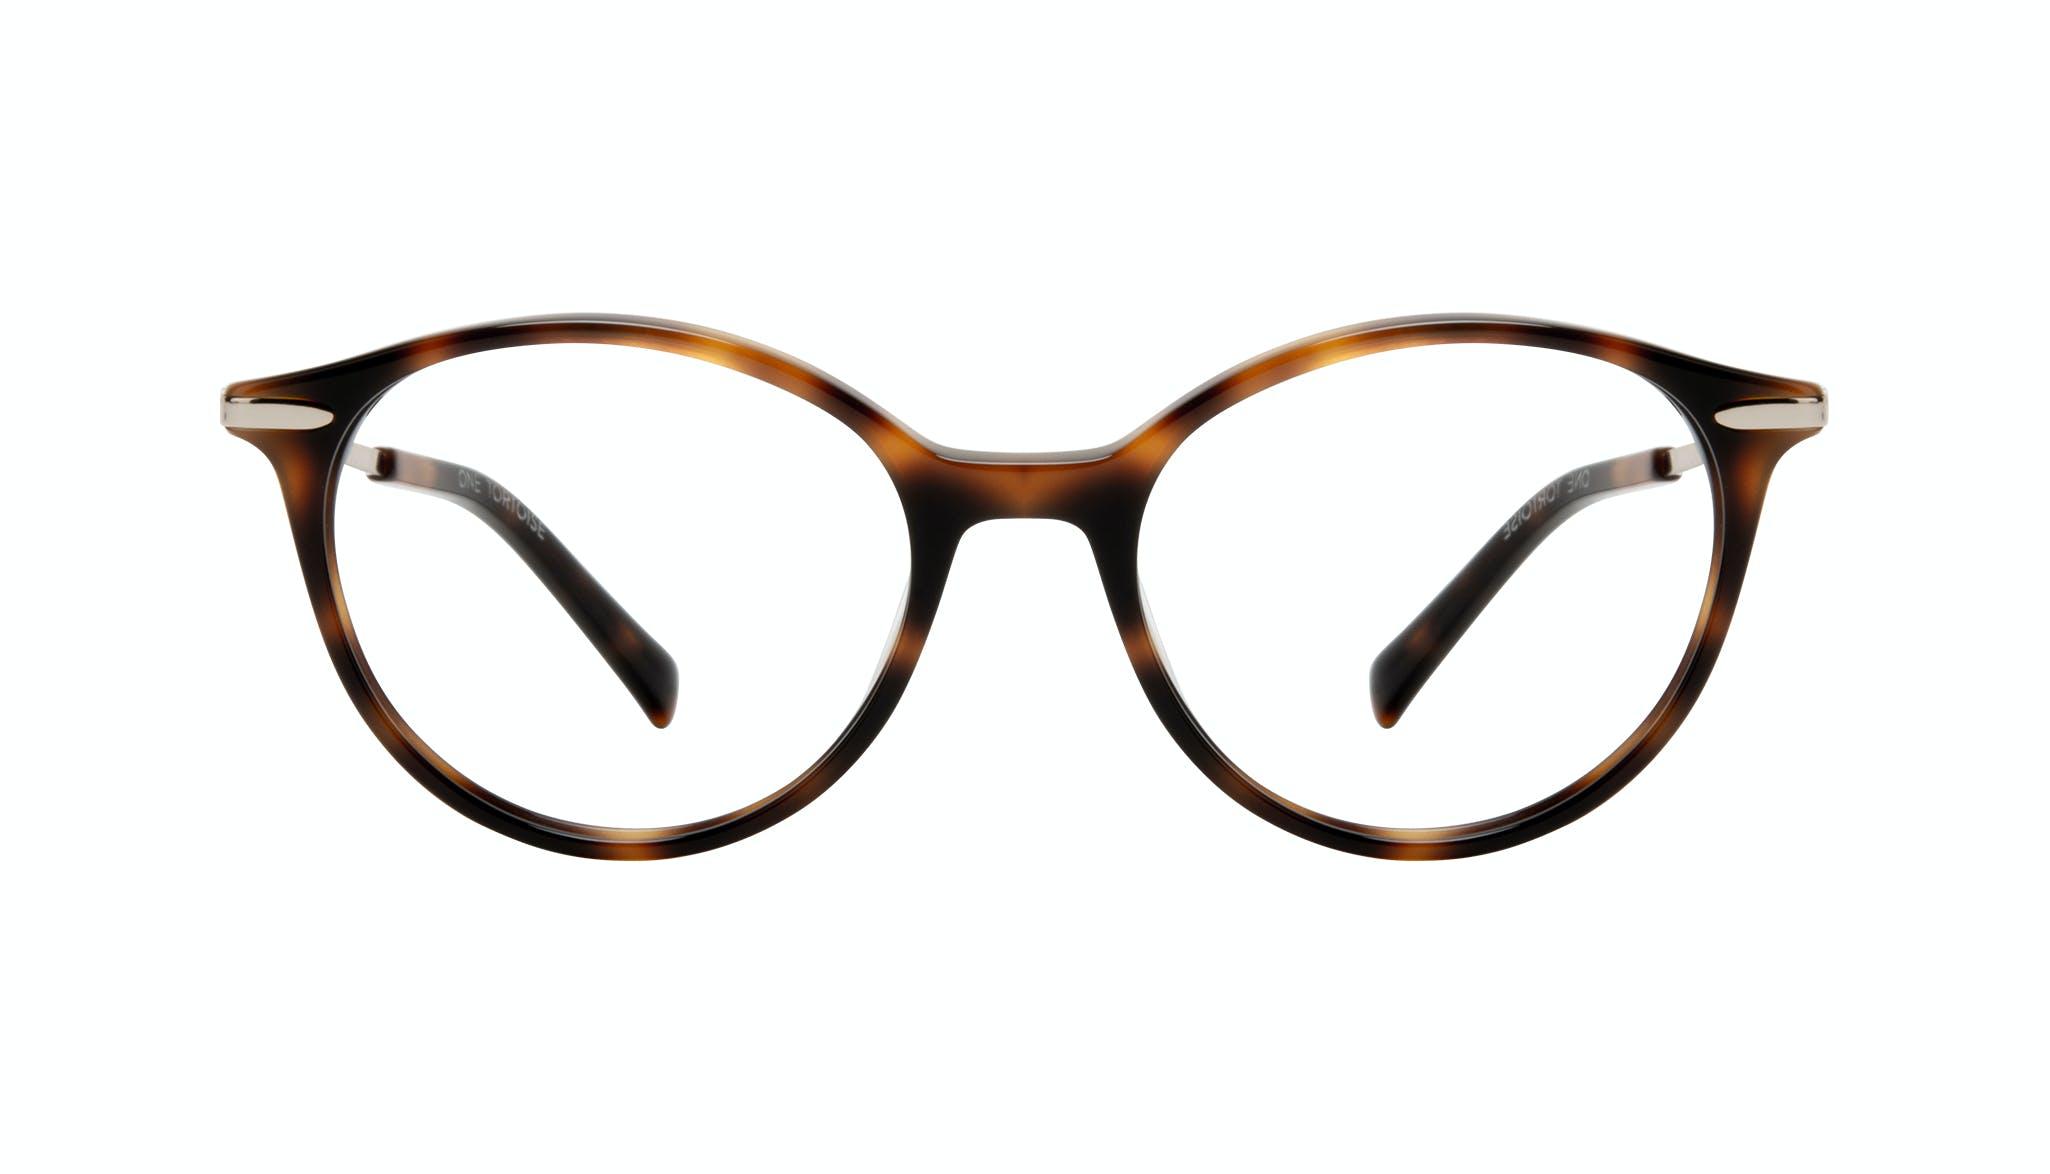 Affordable Fashion Glasses Round Eyeglasses Women One Tortoise